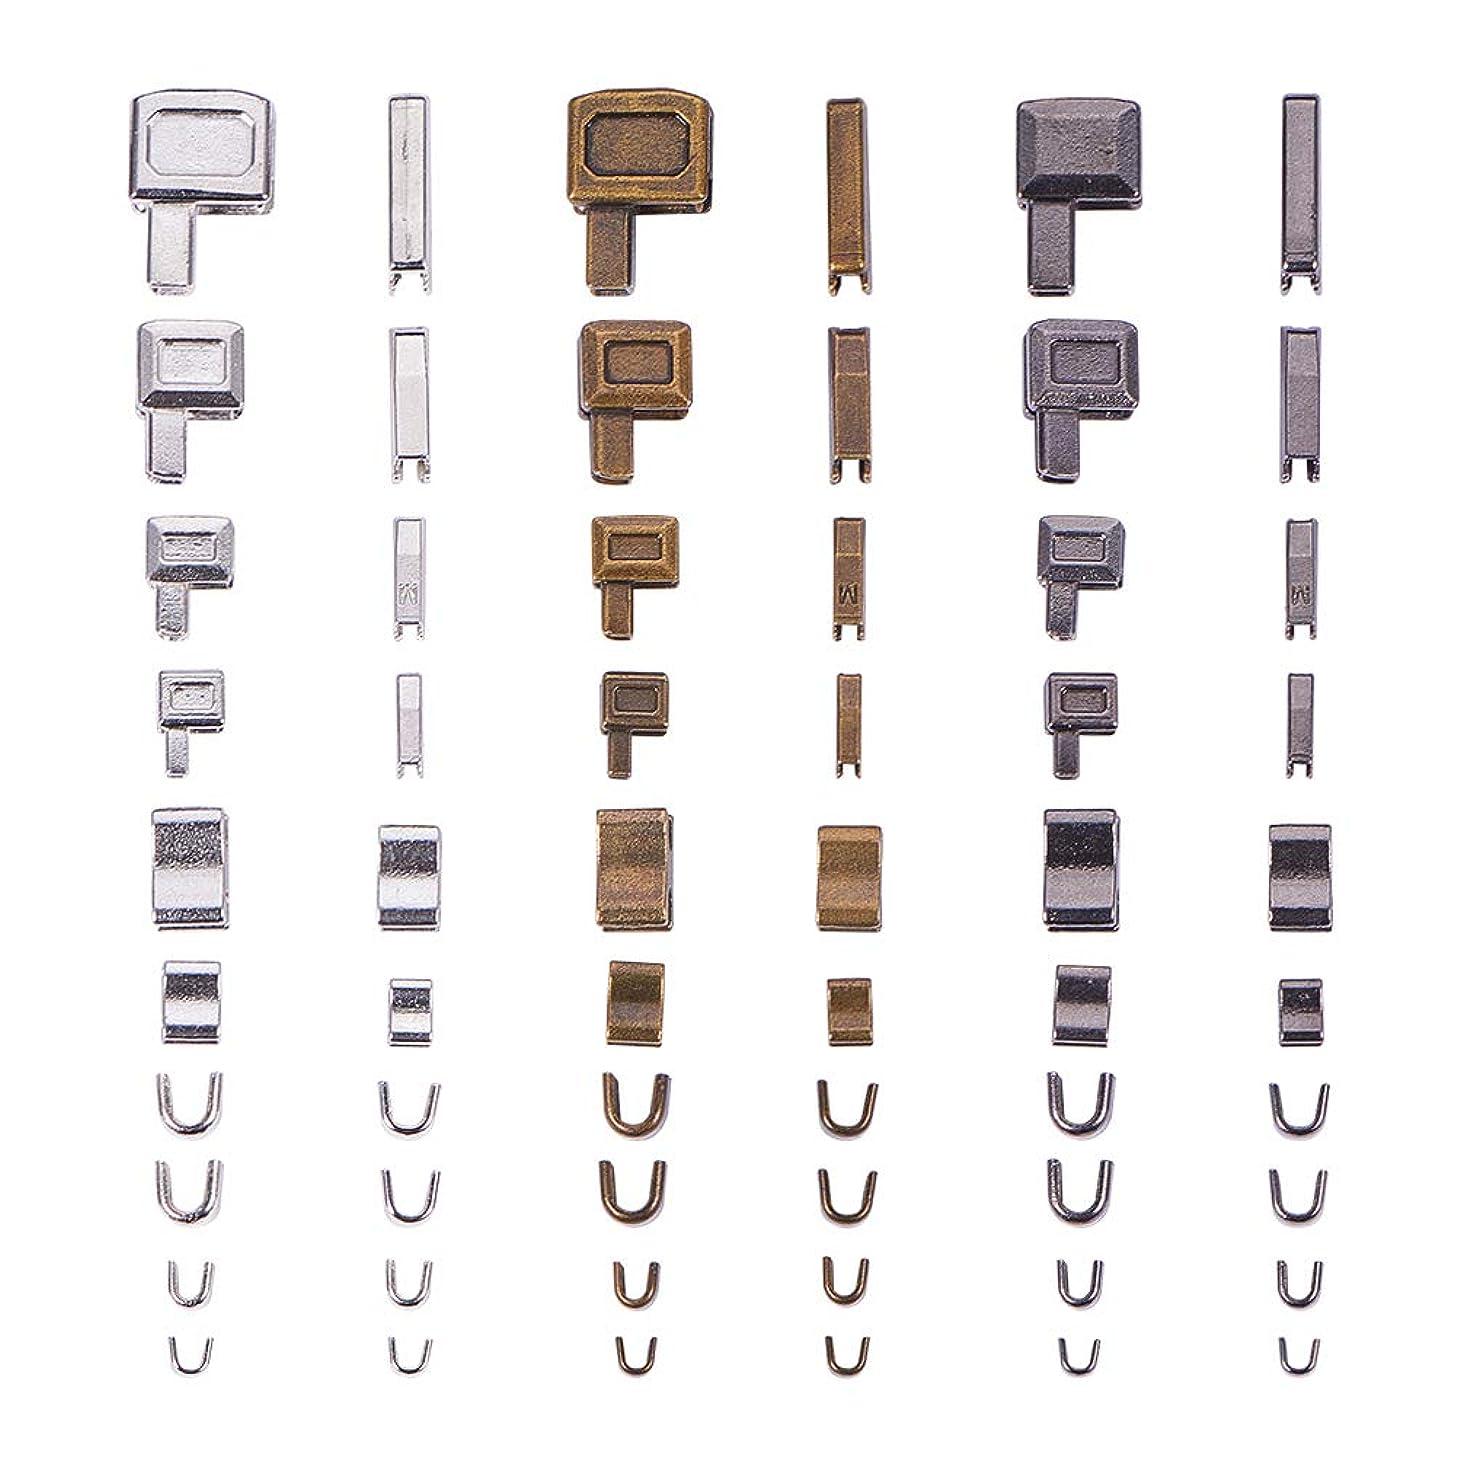 PH PandaHall 12 Sets 3 Color Metal Zipper Head Sliders Retainer Insertion Pin Zipper On The Top Plug and Repair Down Zipper Stopper for Zipper Repair Kit